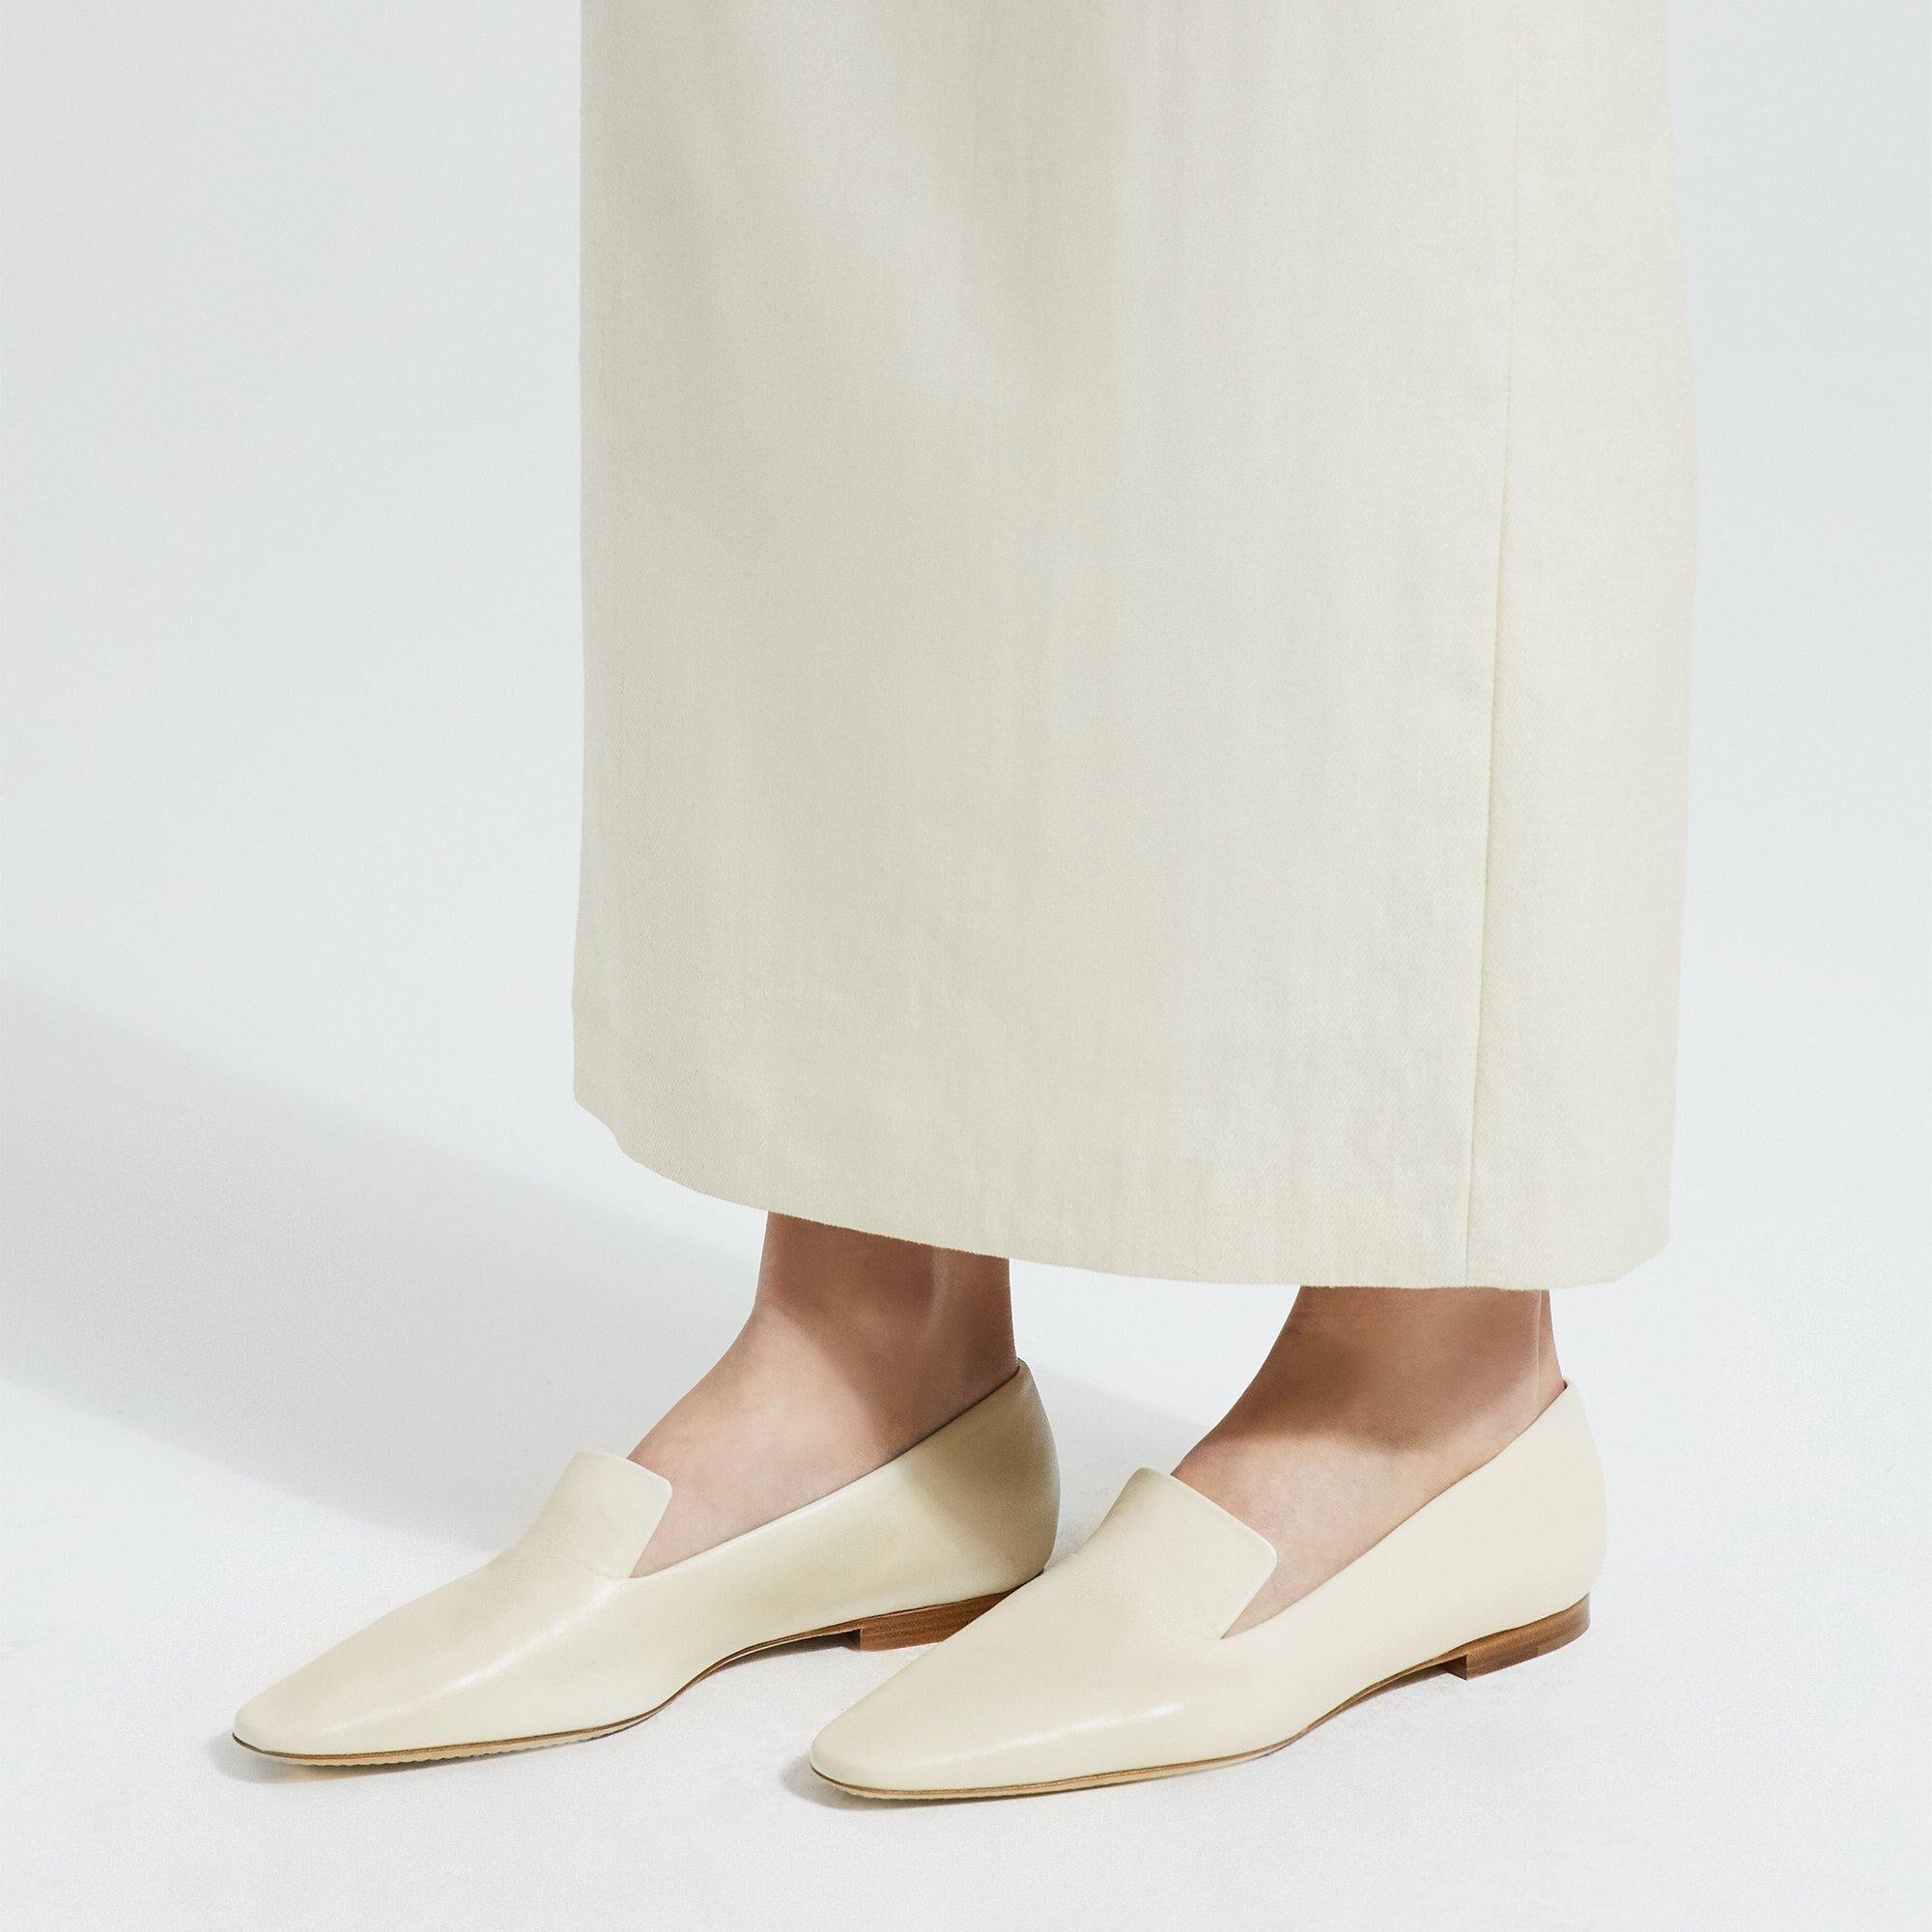 Theory Vintage Slipper  - IVORY - female - Size: 39